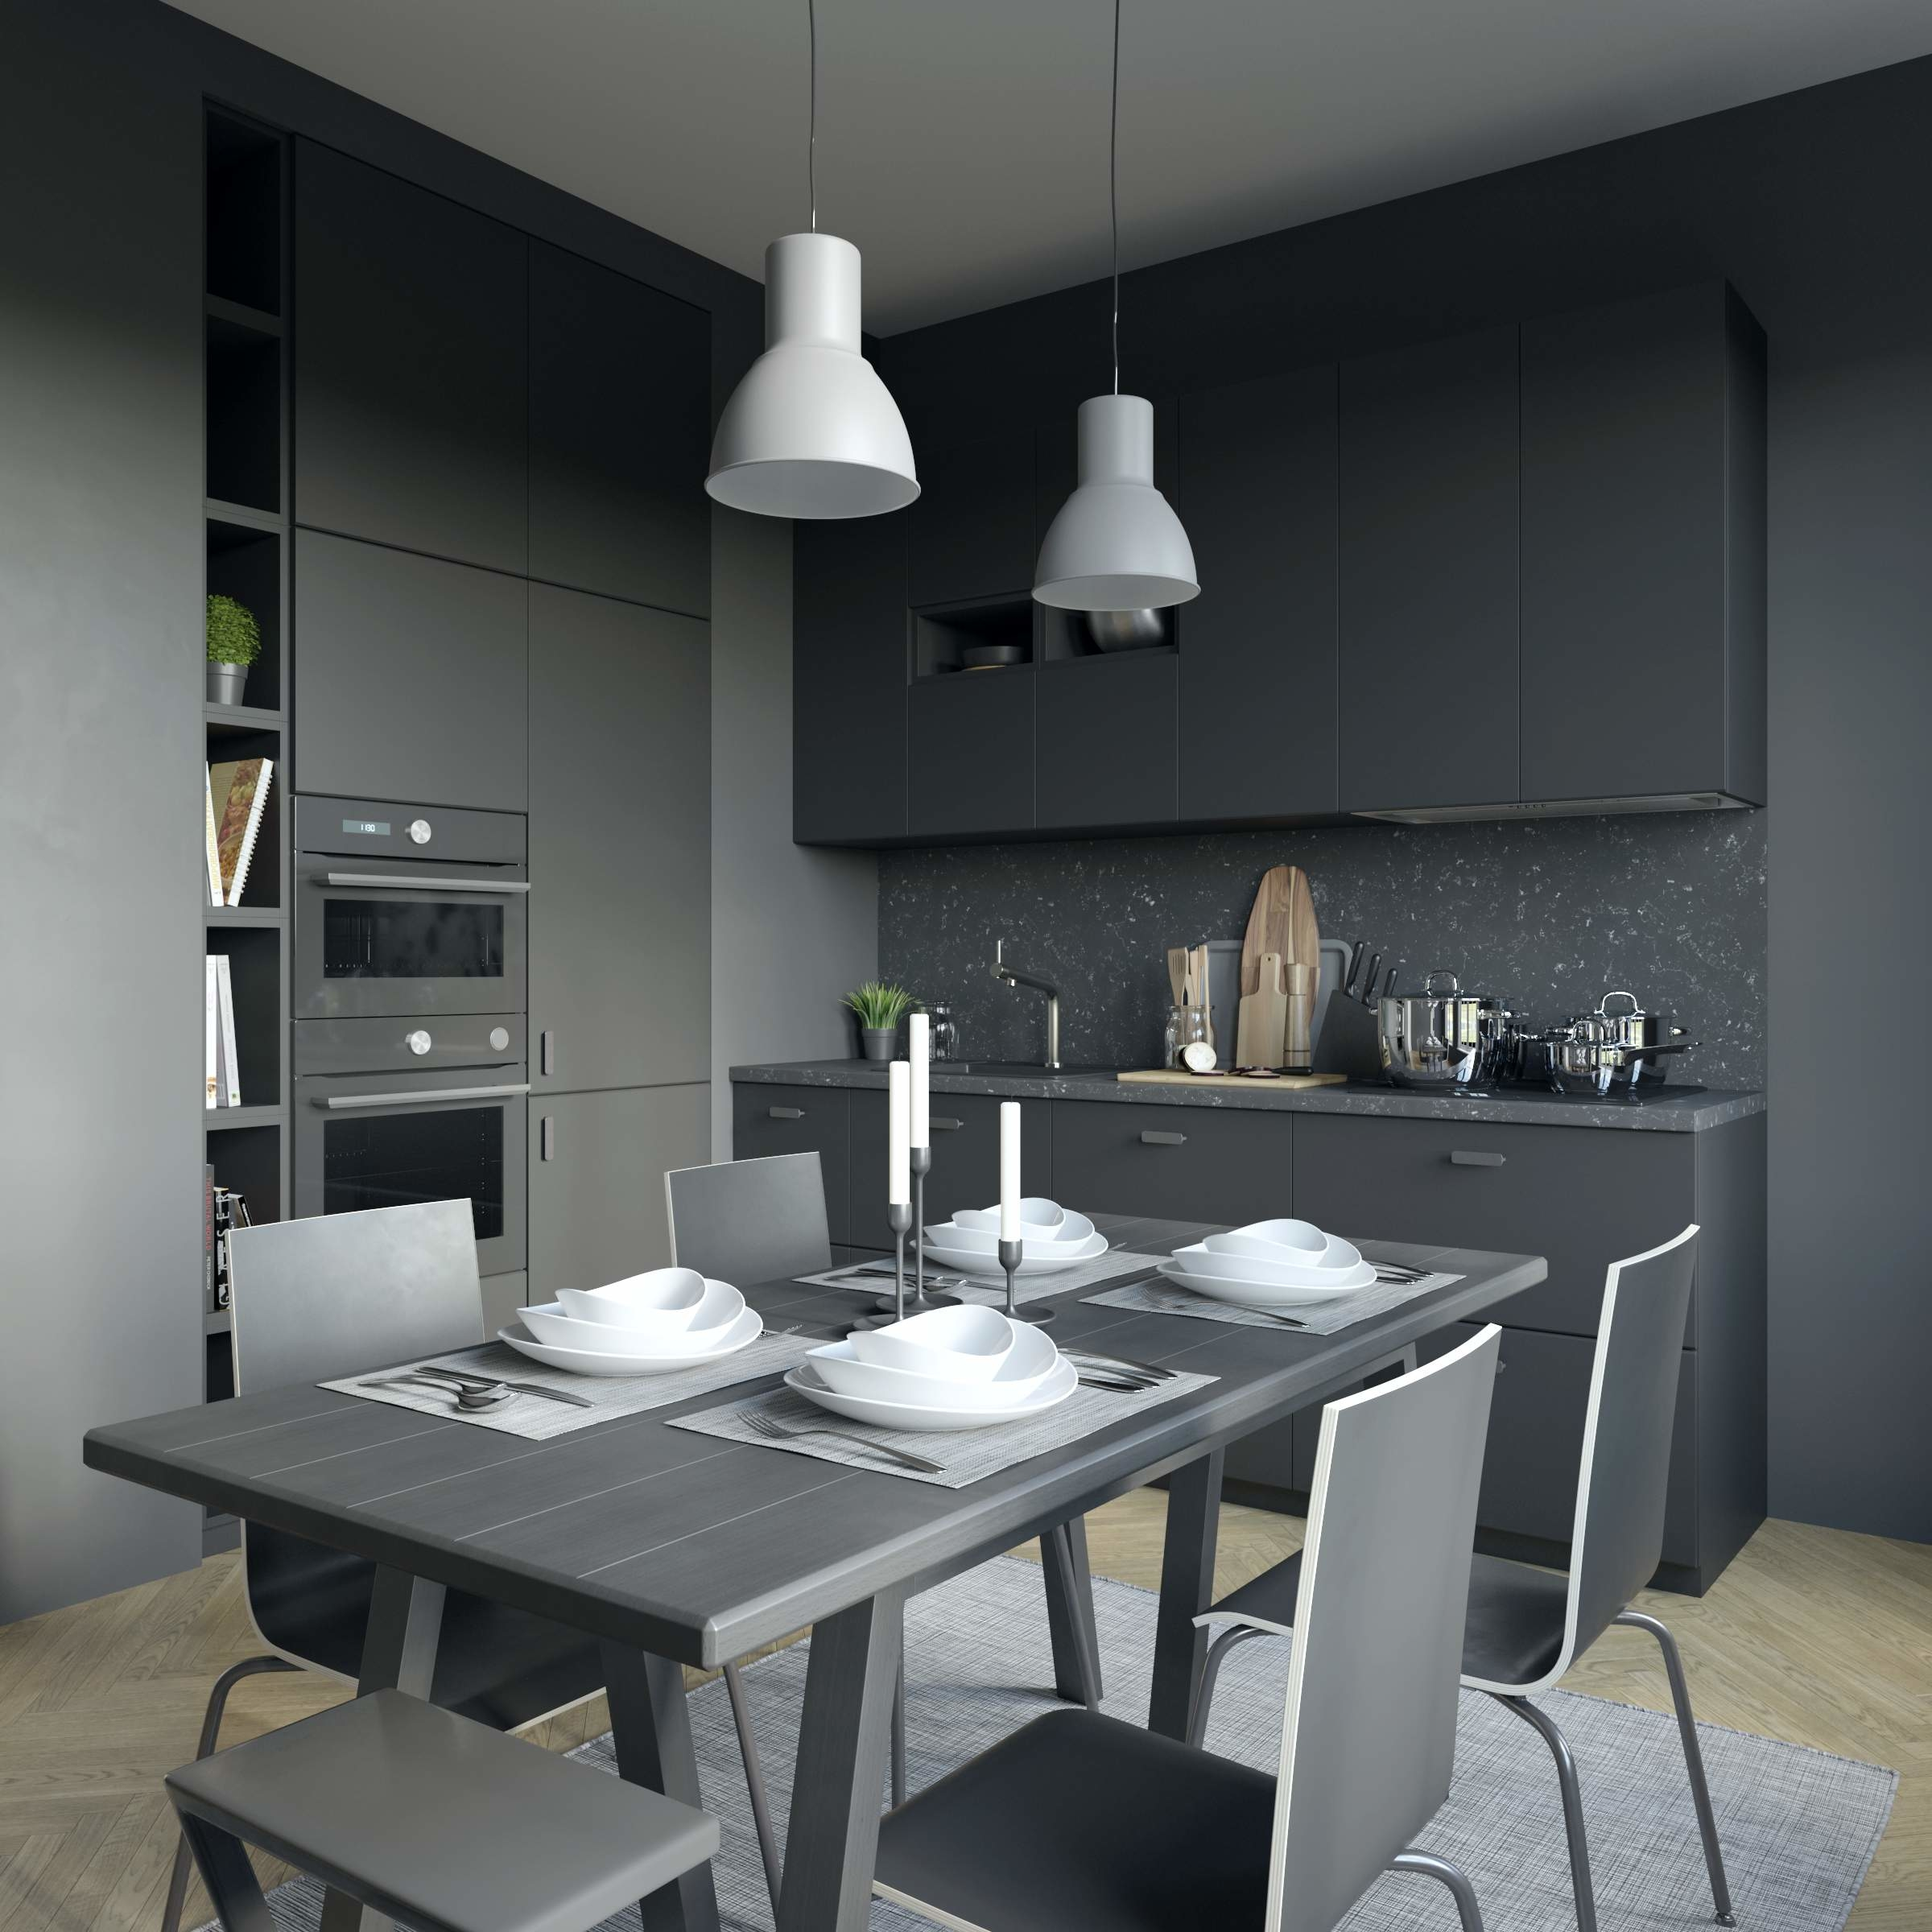 Kitchen IKEA Kungsbacka